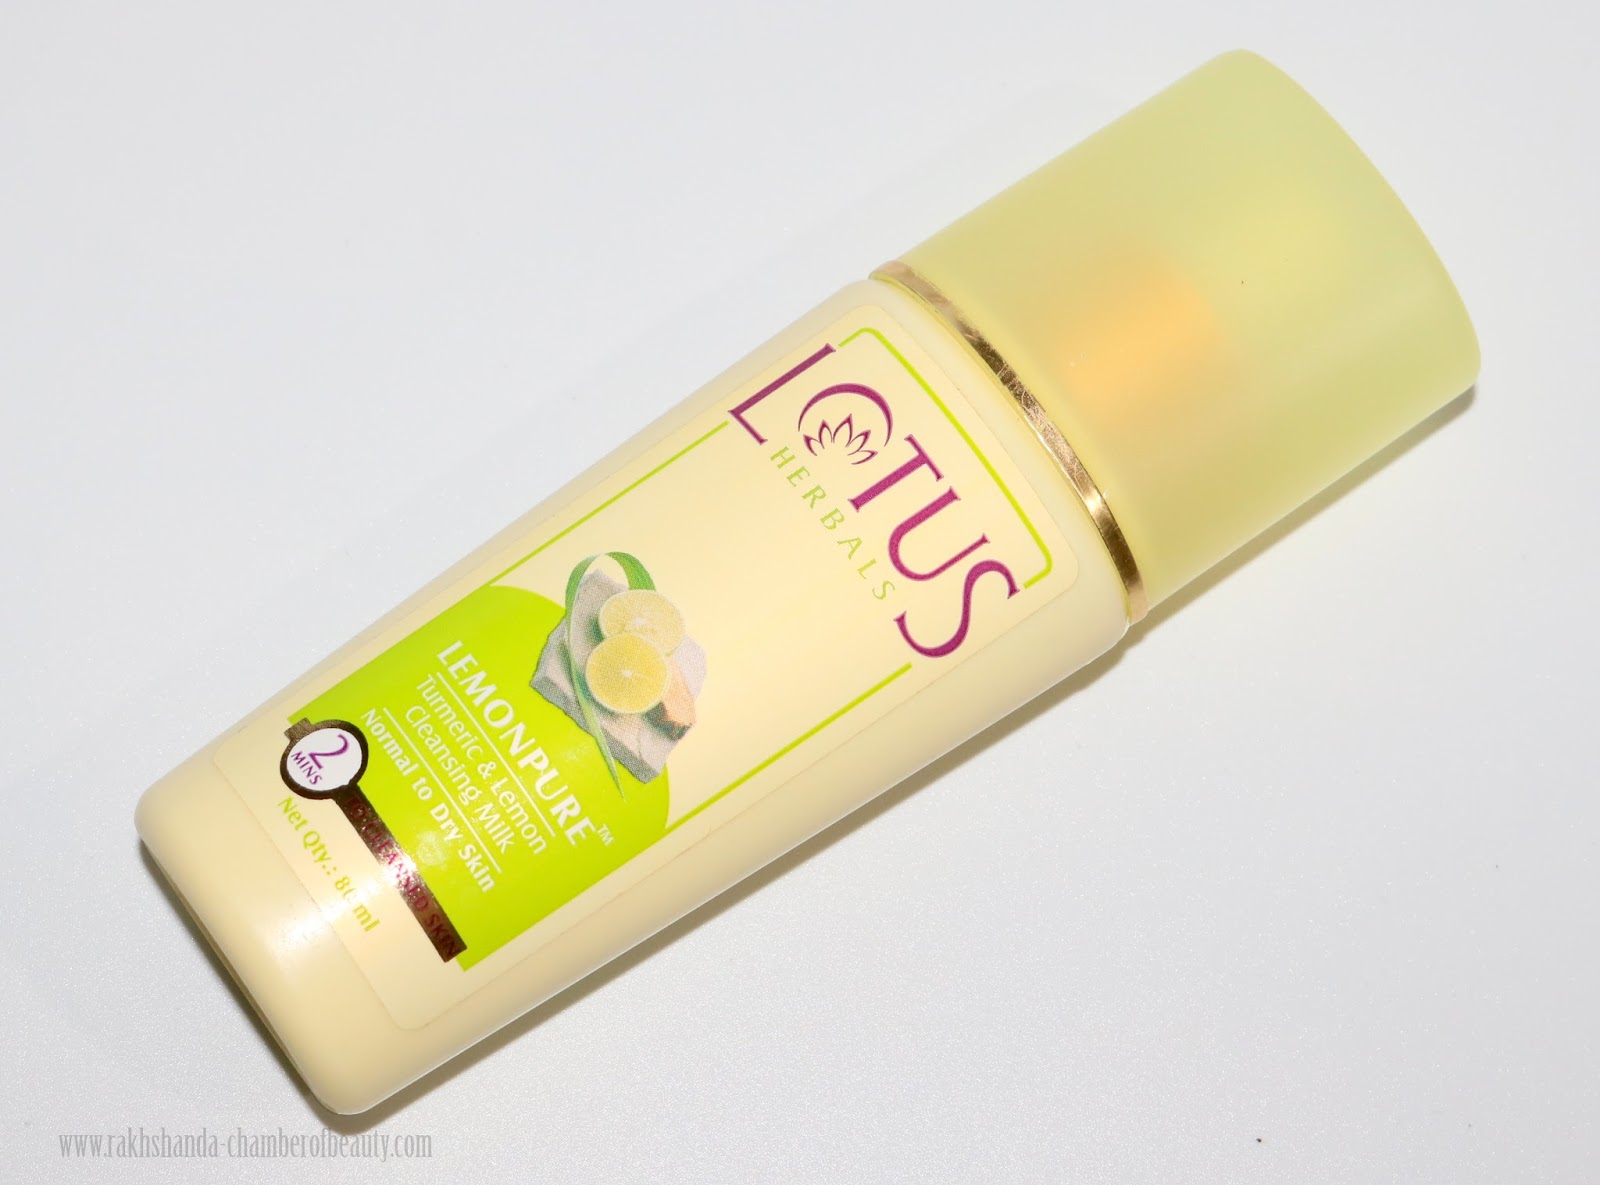 Lotus Herbals Lemonpure Cleansing Milk Review